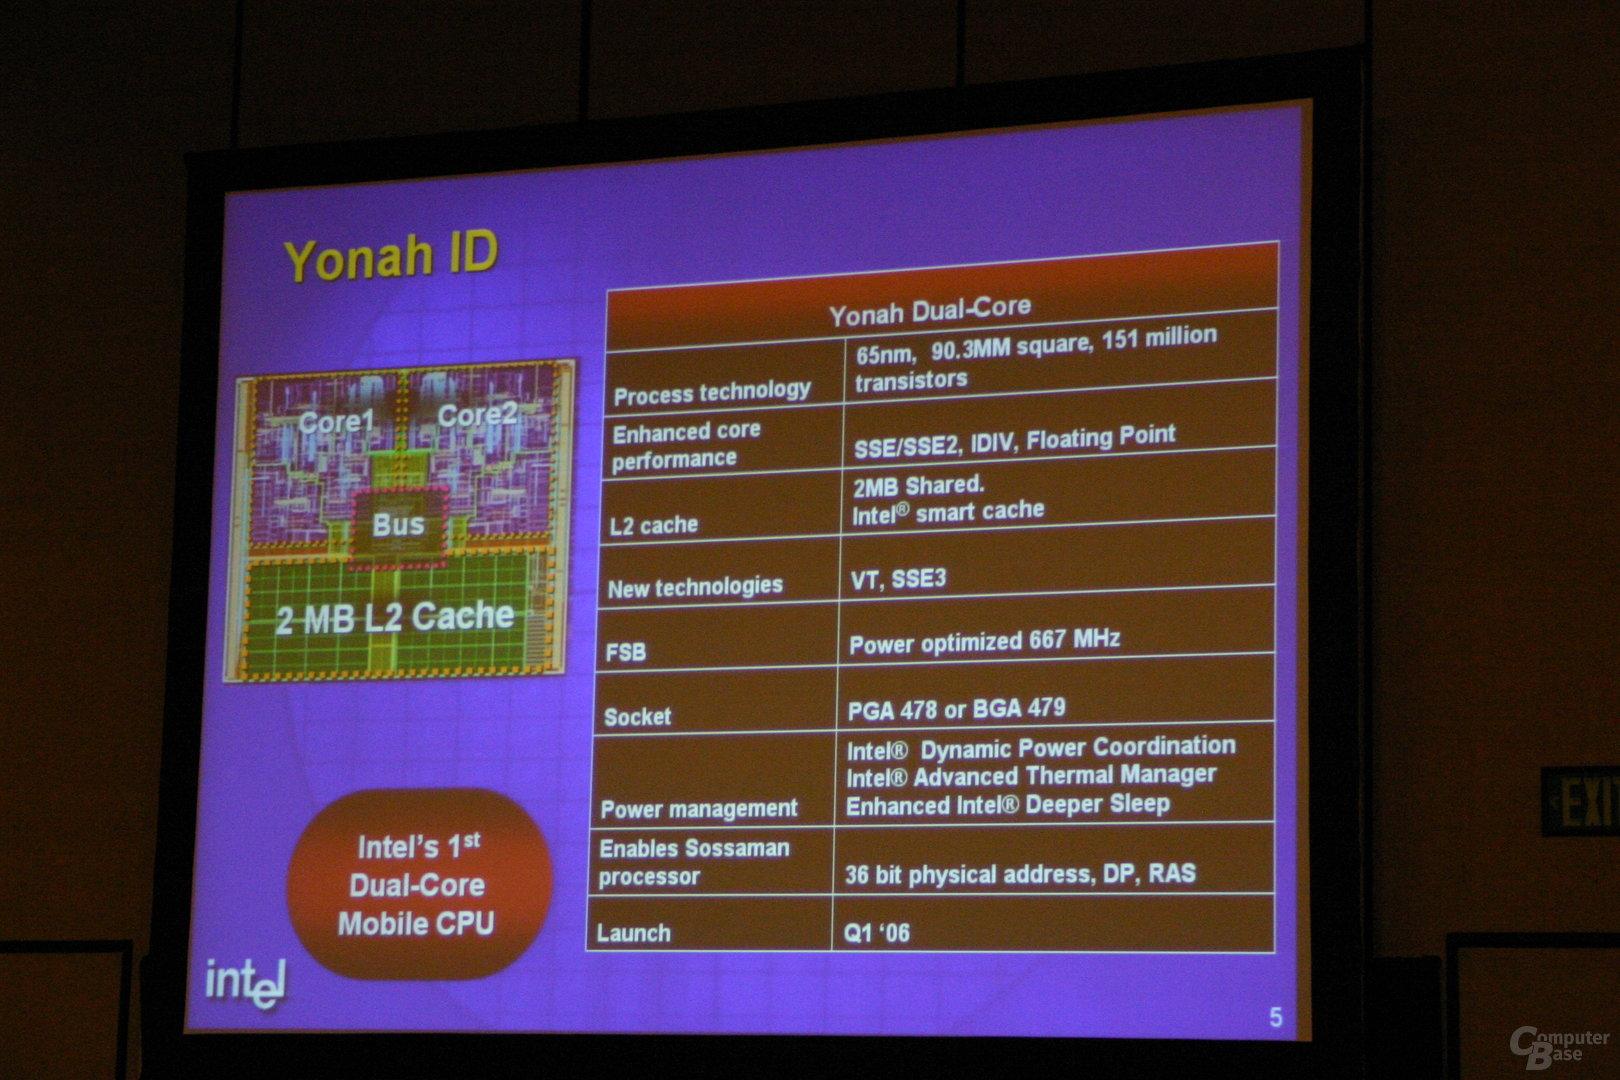 IDF: Fakten zum Yonah